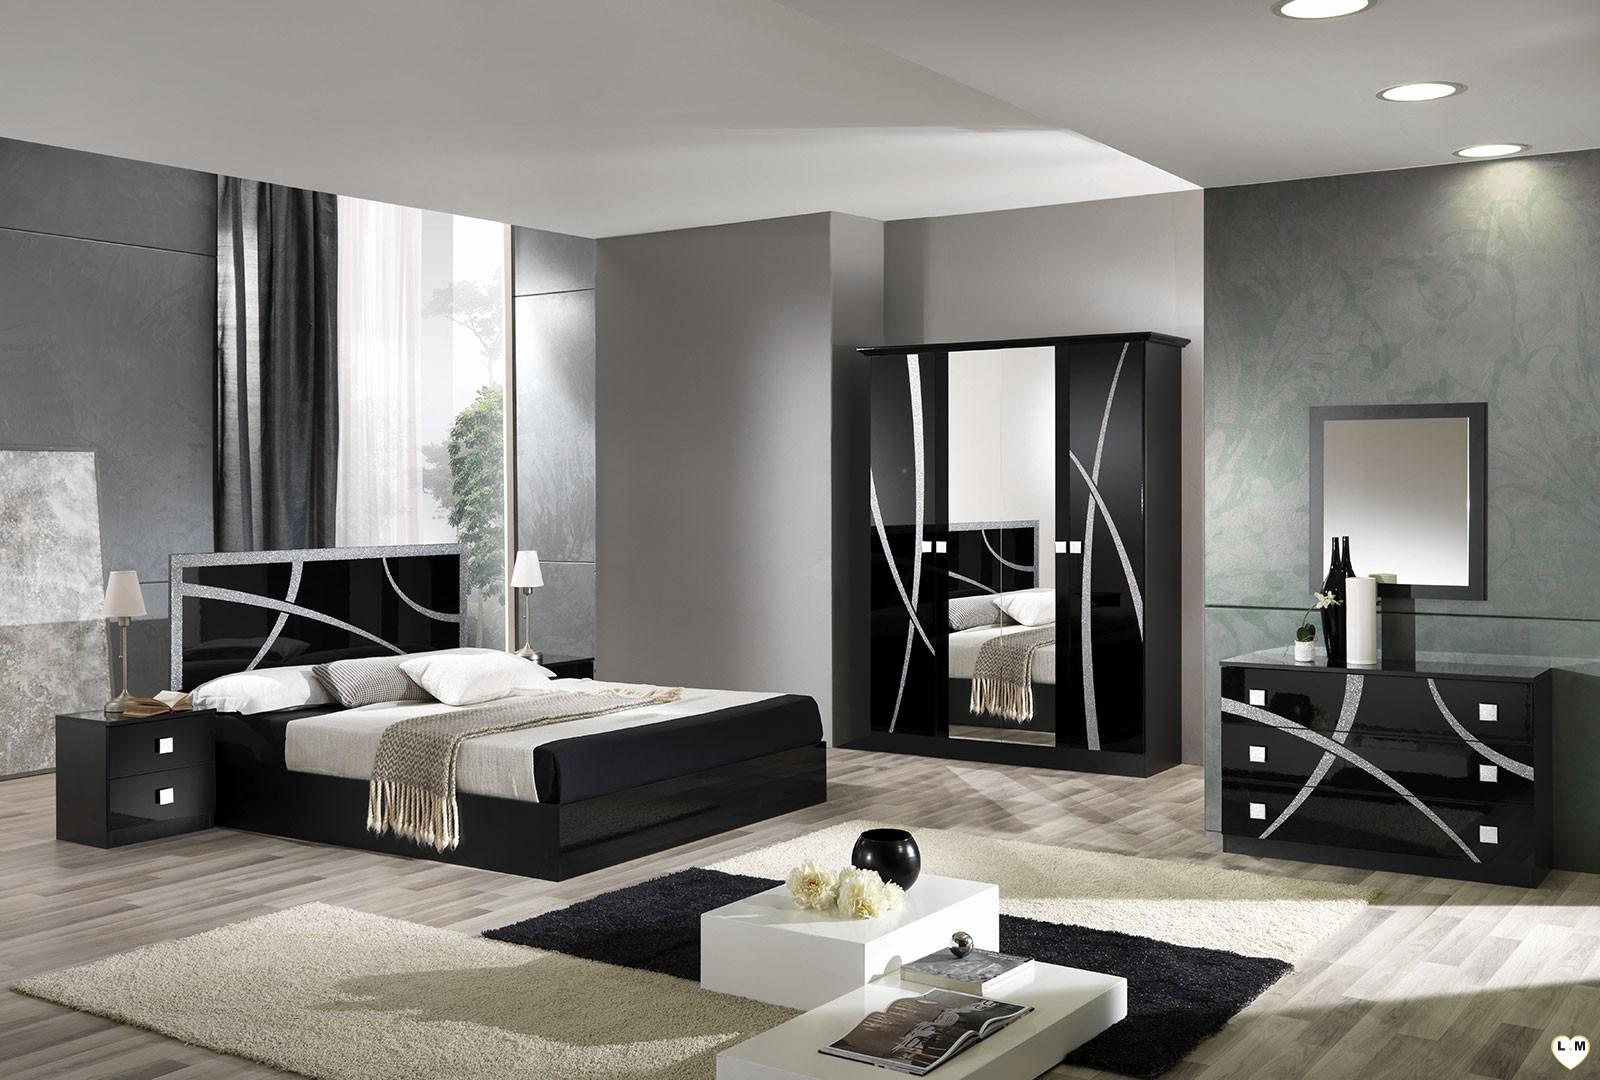 best chambre a coucher italienne marron ideas design trends 2017. Black Bedroom Furniture Sets. Home Design Ideas